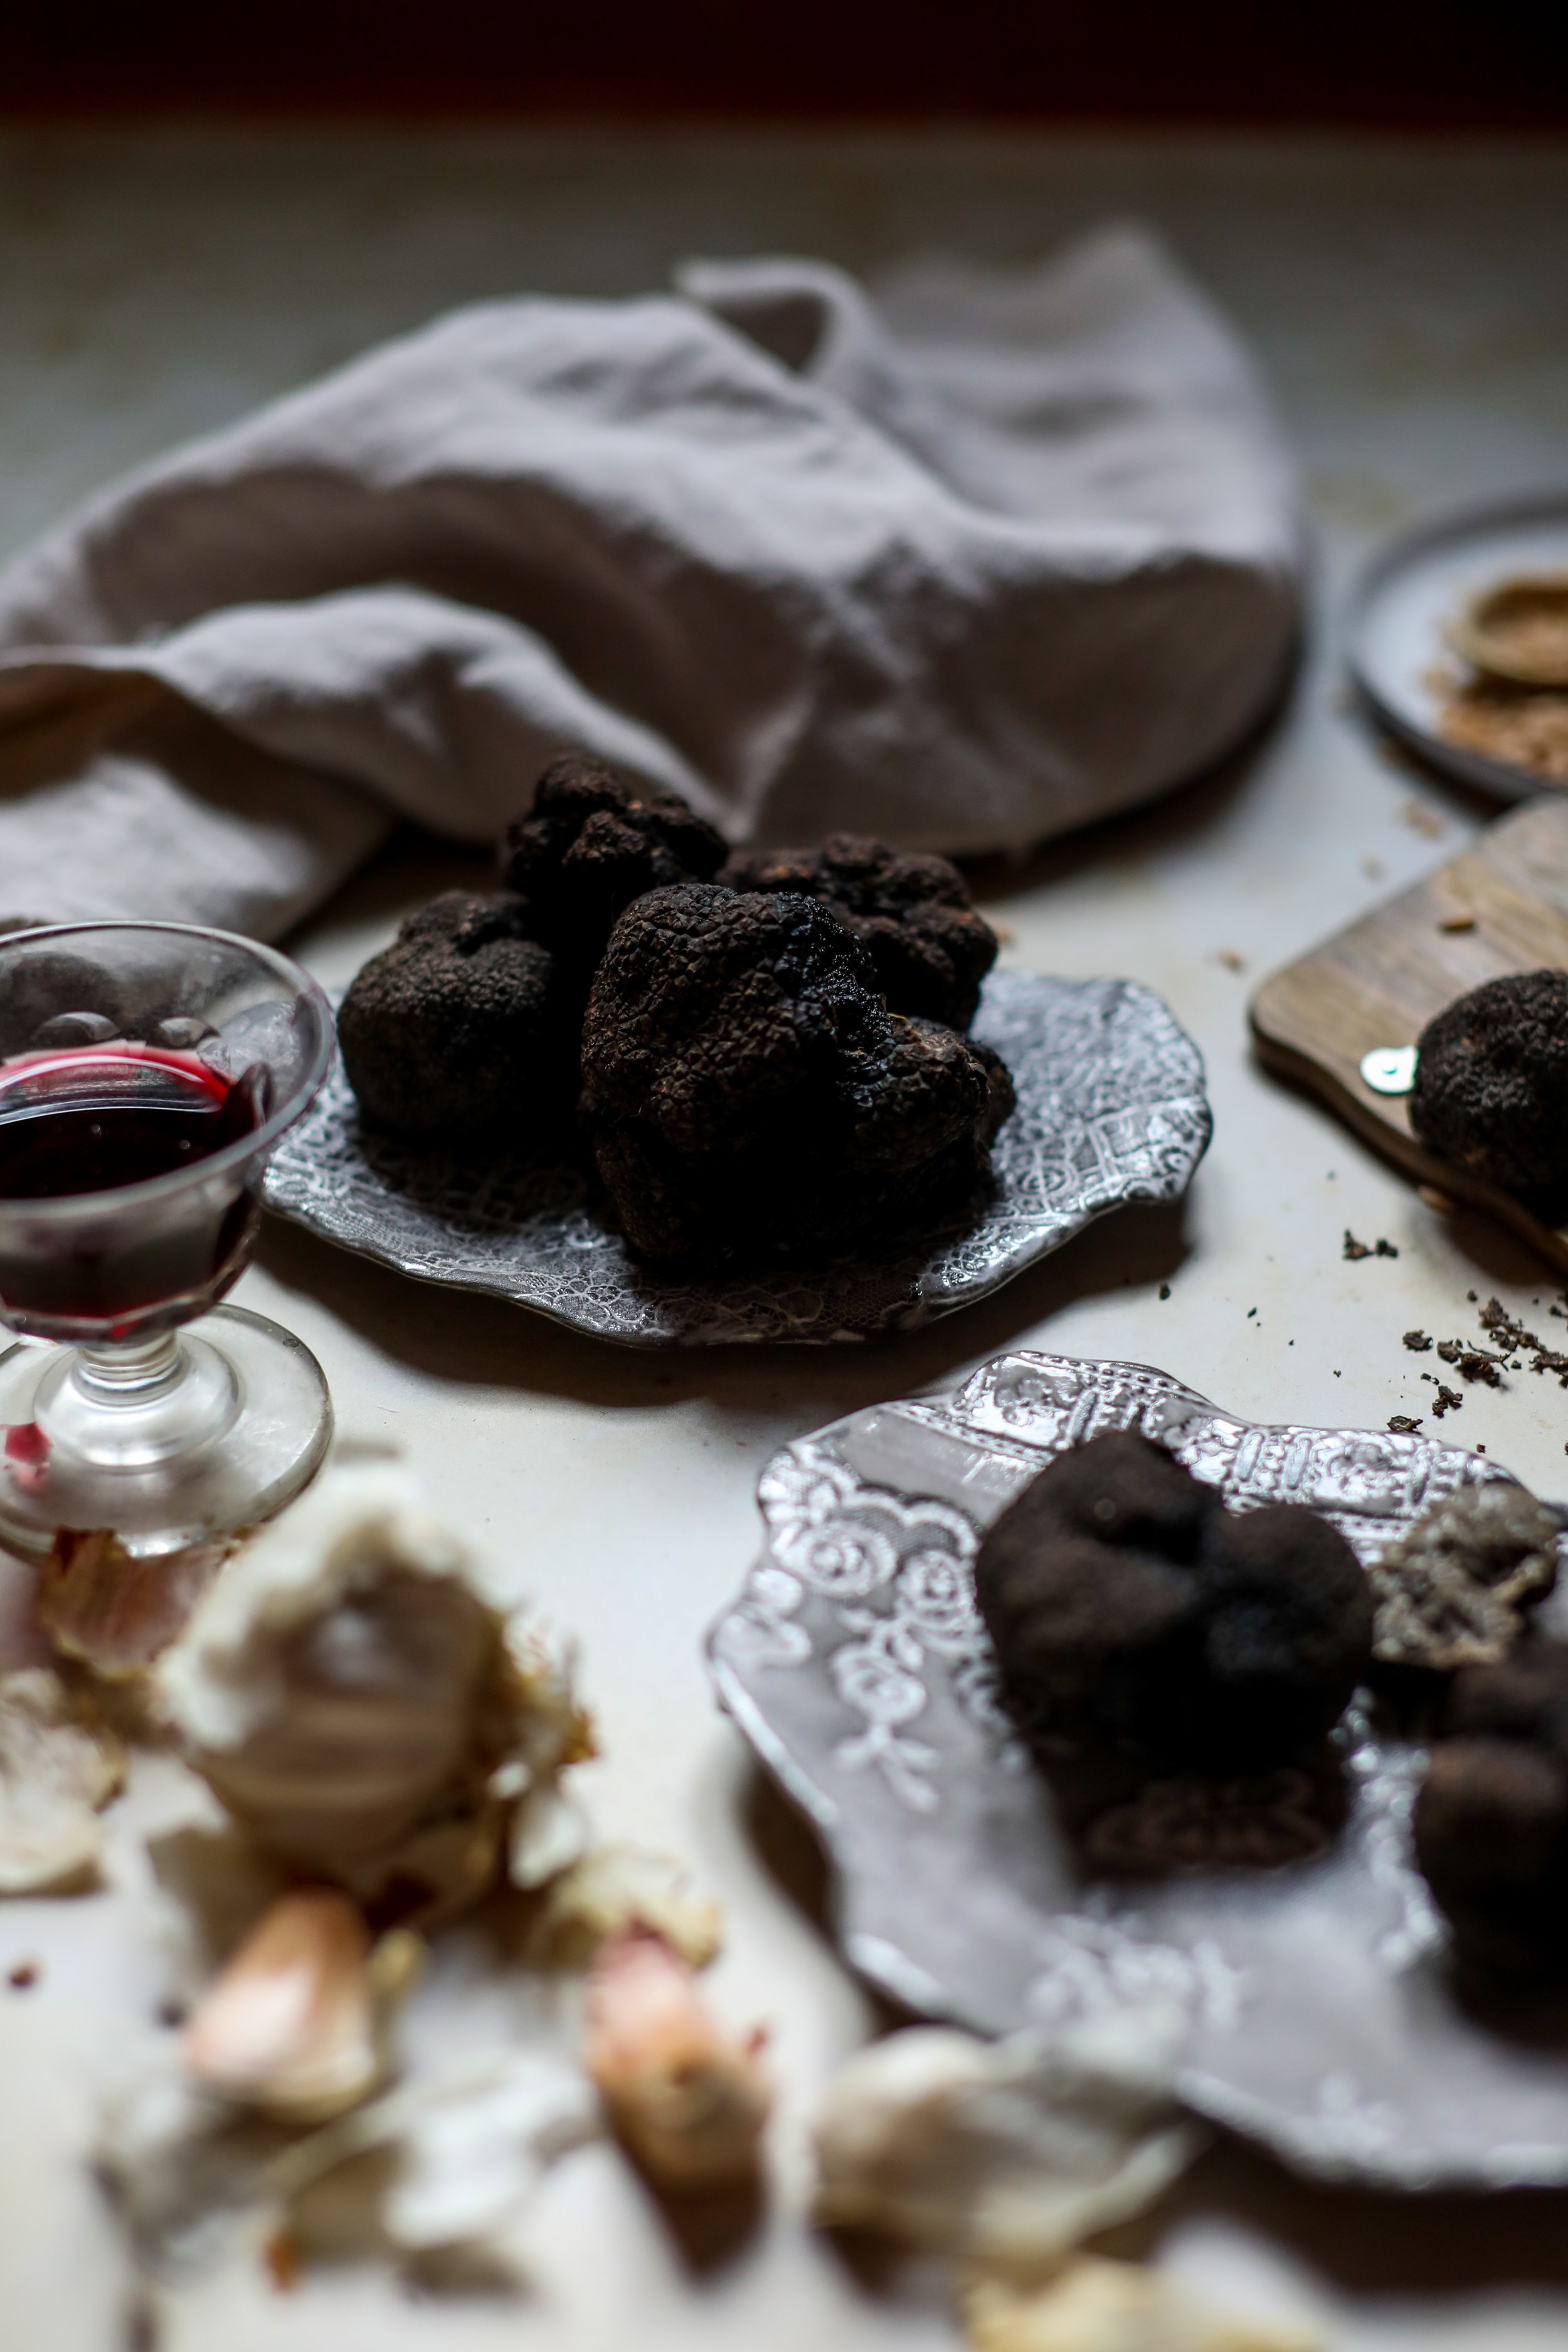 Truffle cookery class, credit Ruth Ribeaucourt